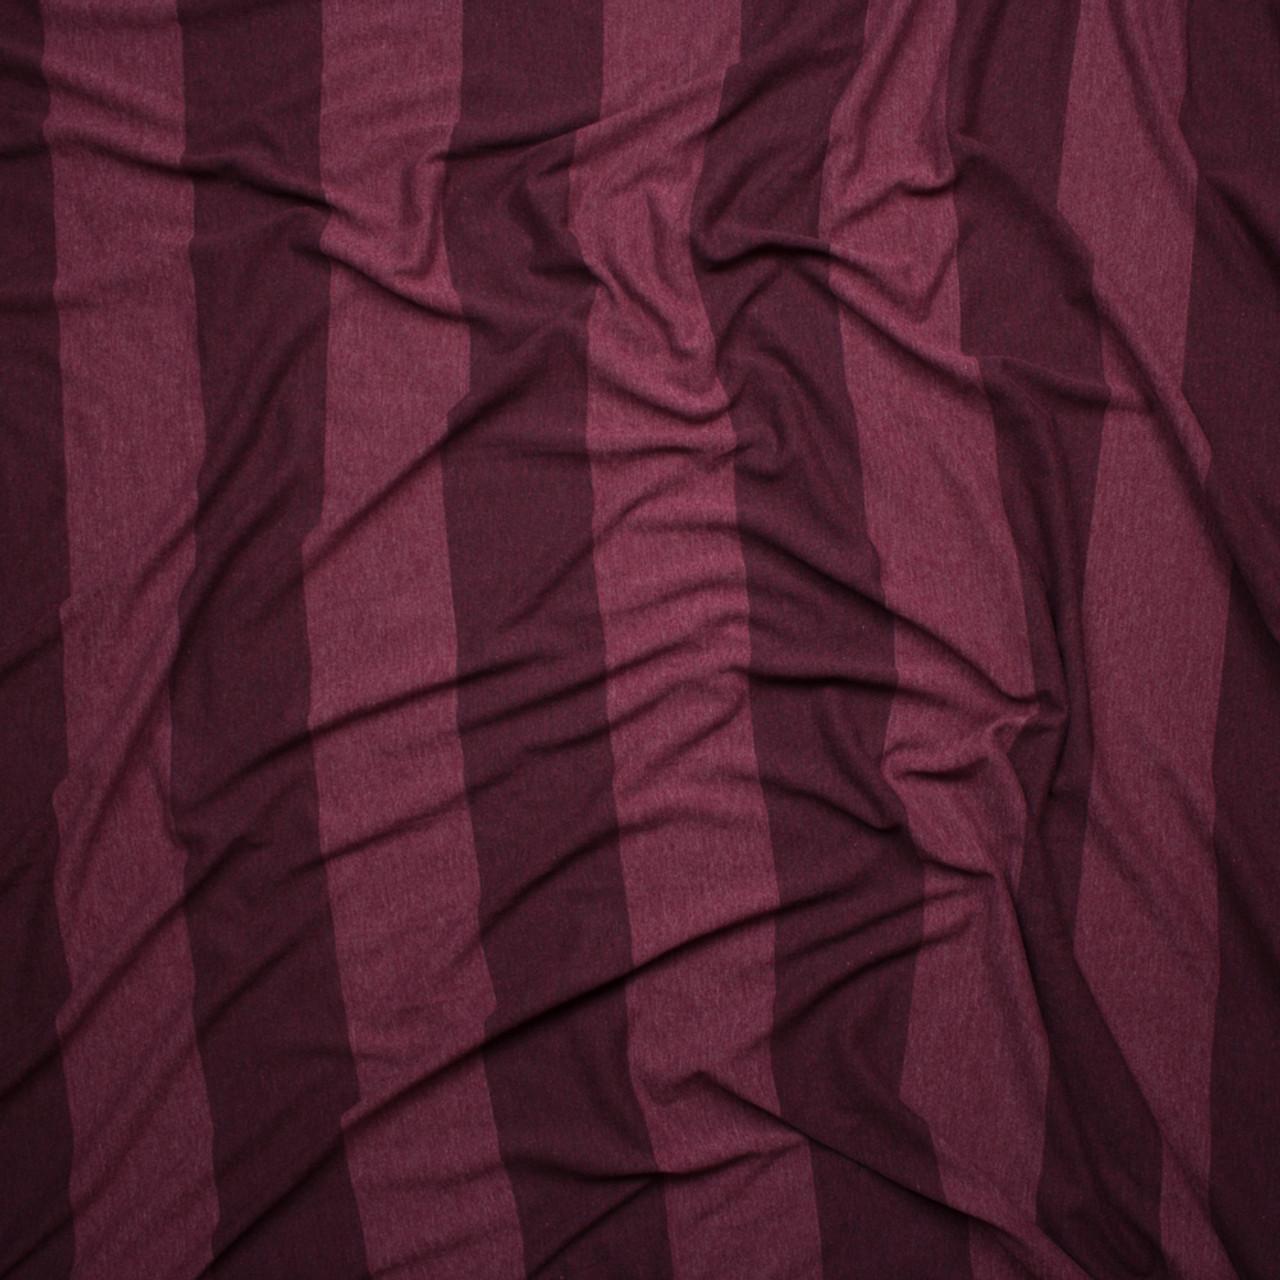 9c6acf6c035 ... Wine Wide Stripe Lightweight Jersey Knit Fabric By The Yard - Wide shot